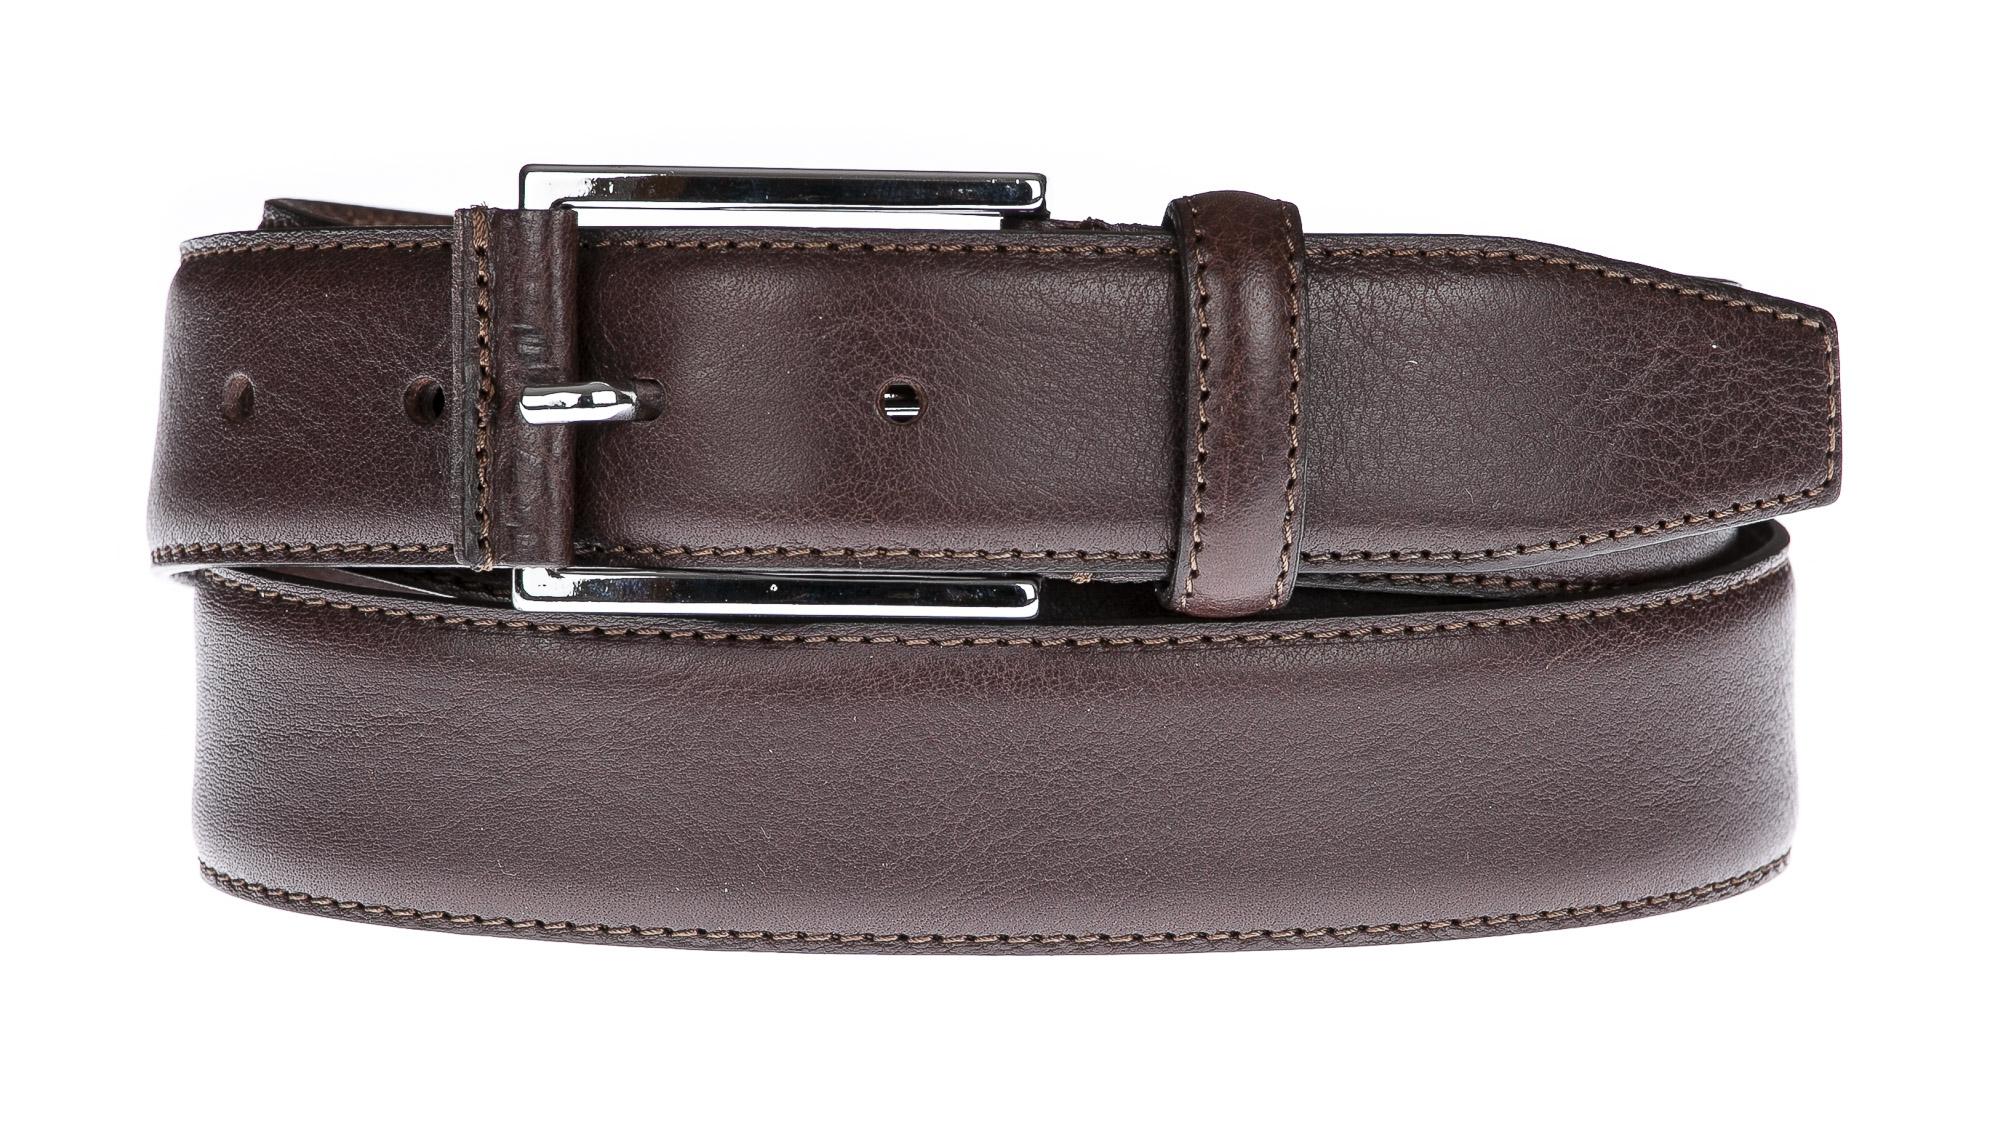 Cintura uomo in vera pelle GUBBIO, colore MARRONE, EMPORIO TITANO, Made in Italy